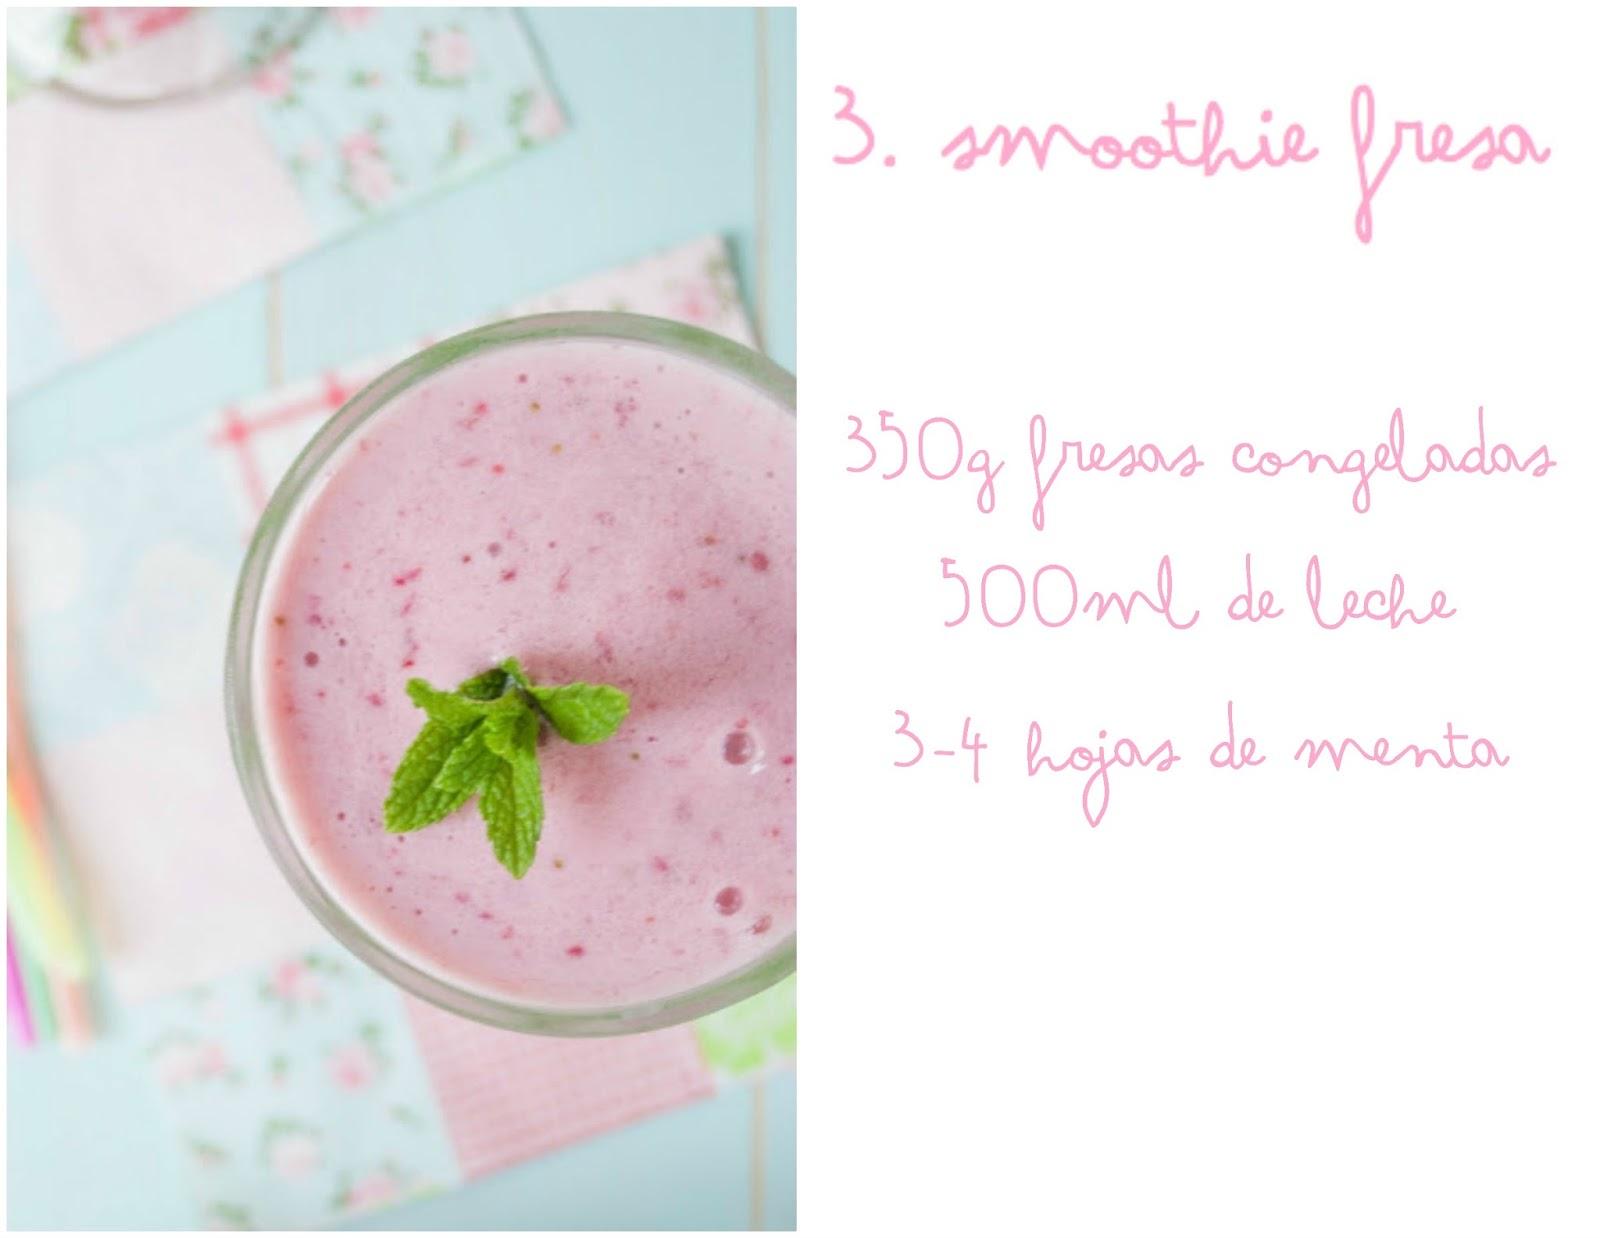 http://thesweetesttaste.blogspot.com.es/2013/05/smoothie-de-fresas-y-menta.html